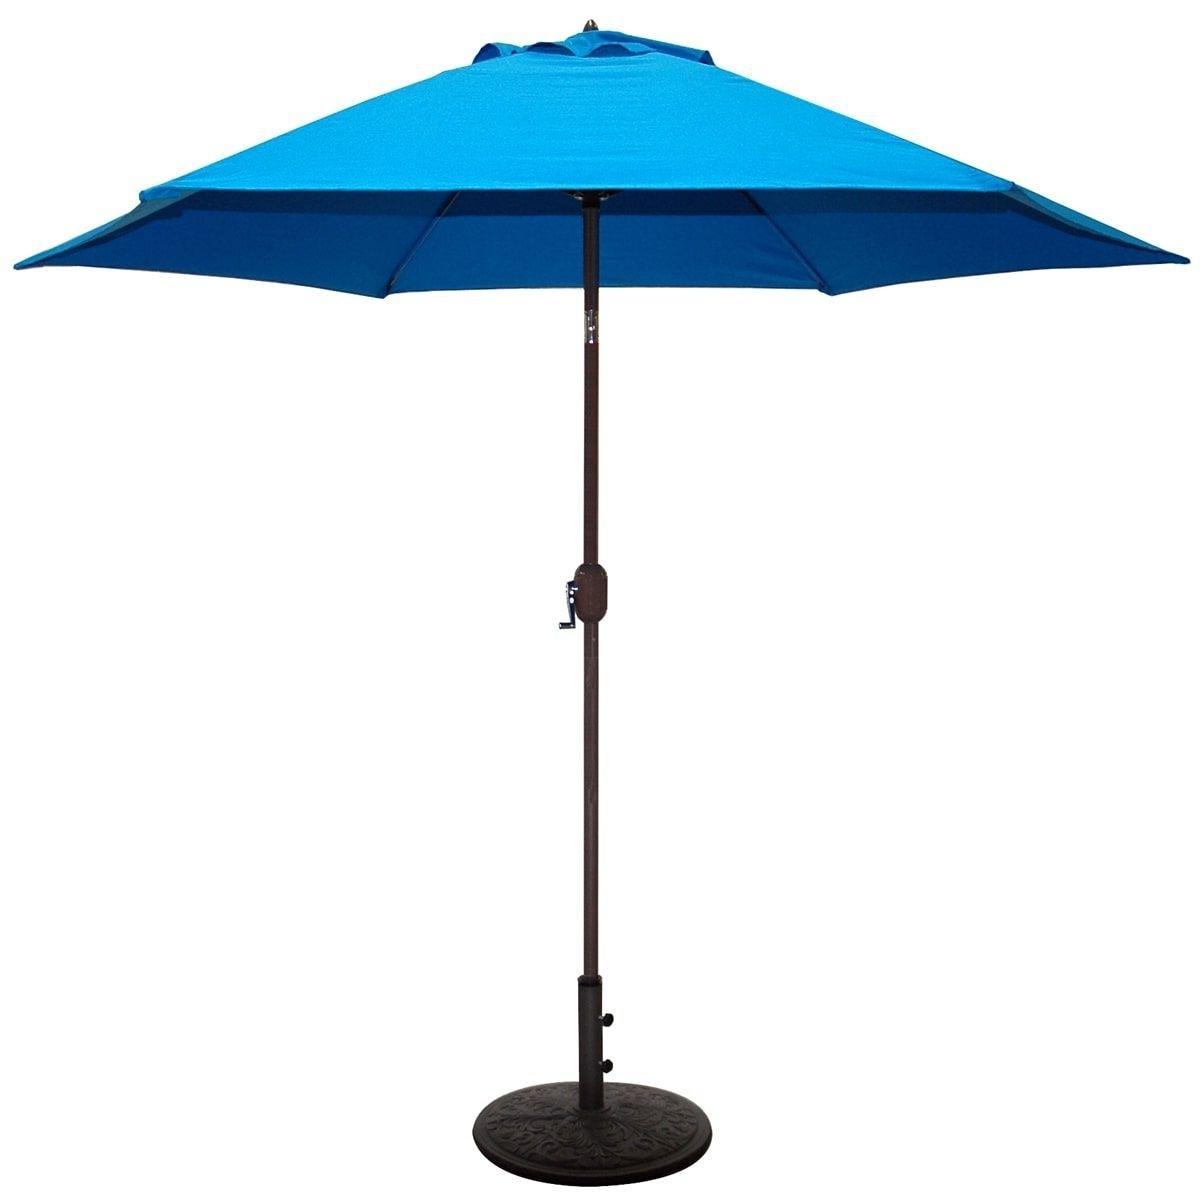 2019 Blue Patio Umbrellas Pertaining To Tropishade 9 Ft (View 9 of 20)